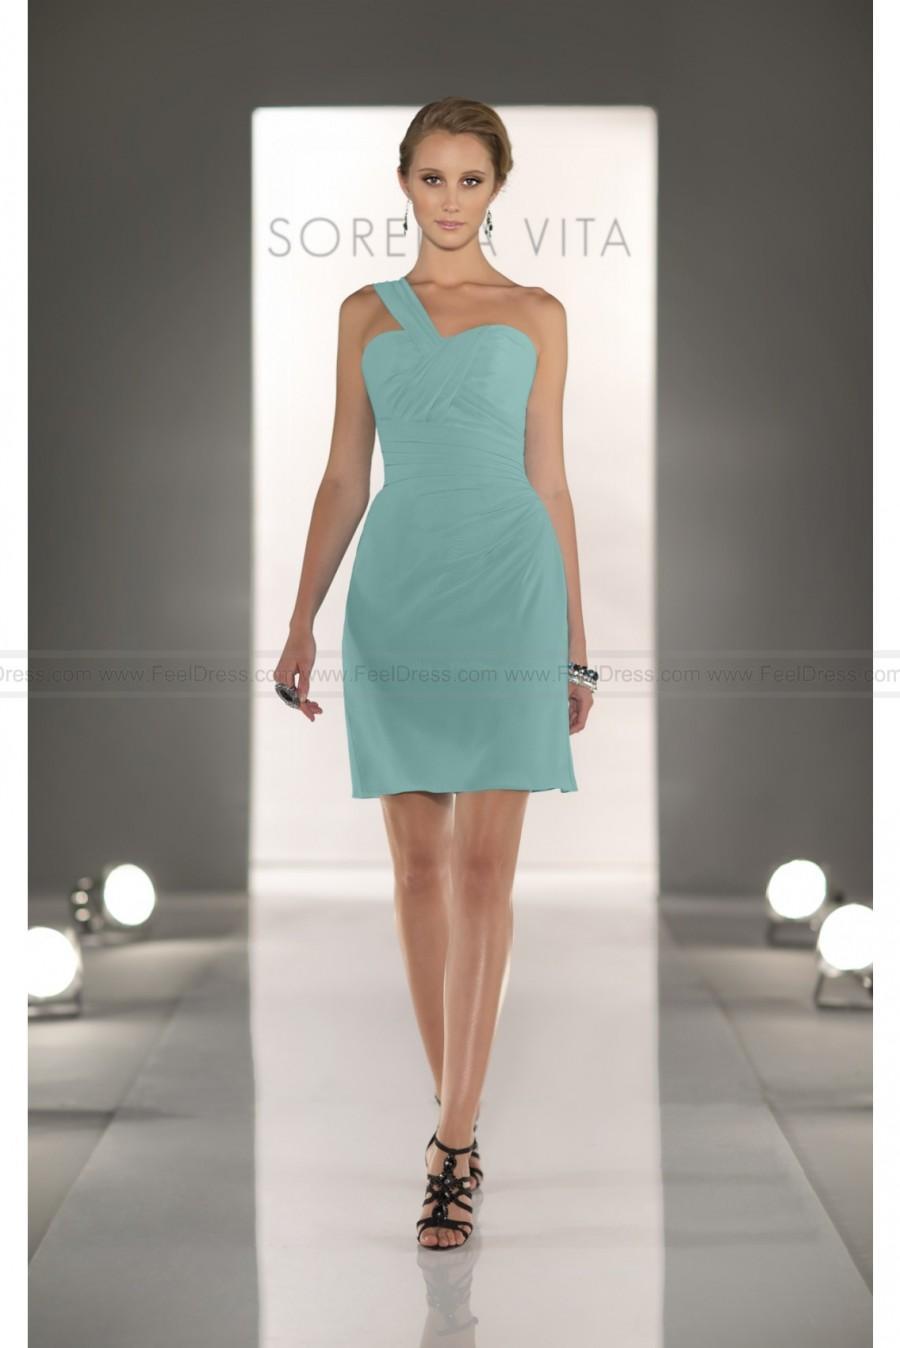 Boda - Sorella Vita Teal Green Bridesmaid Dress Style 8280